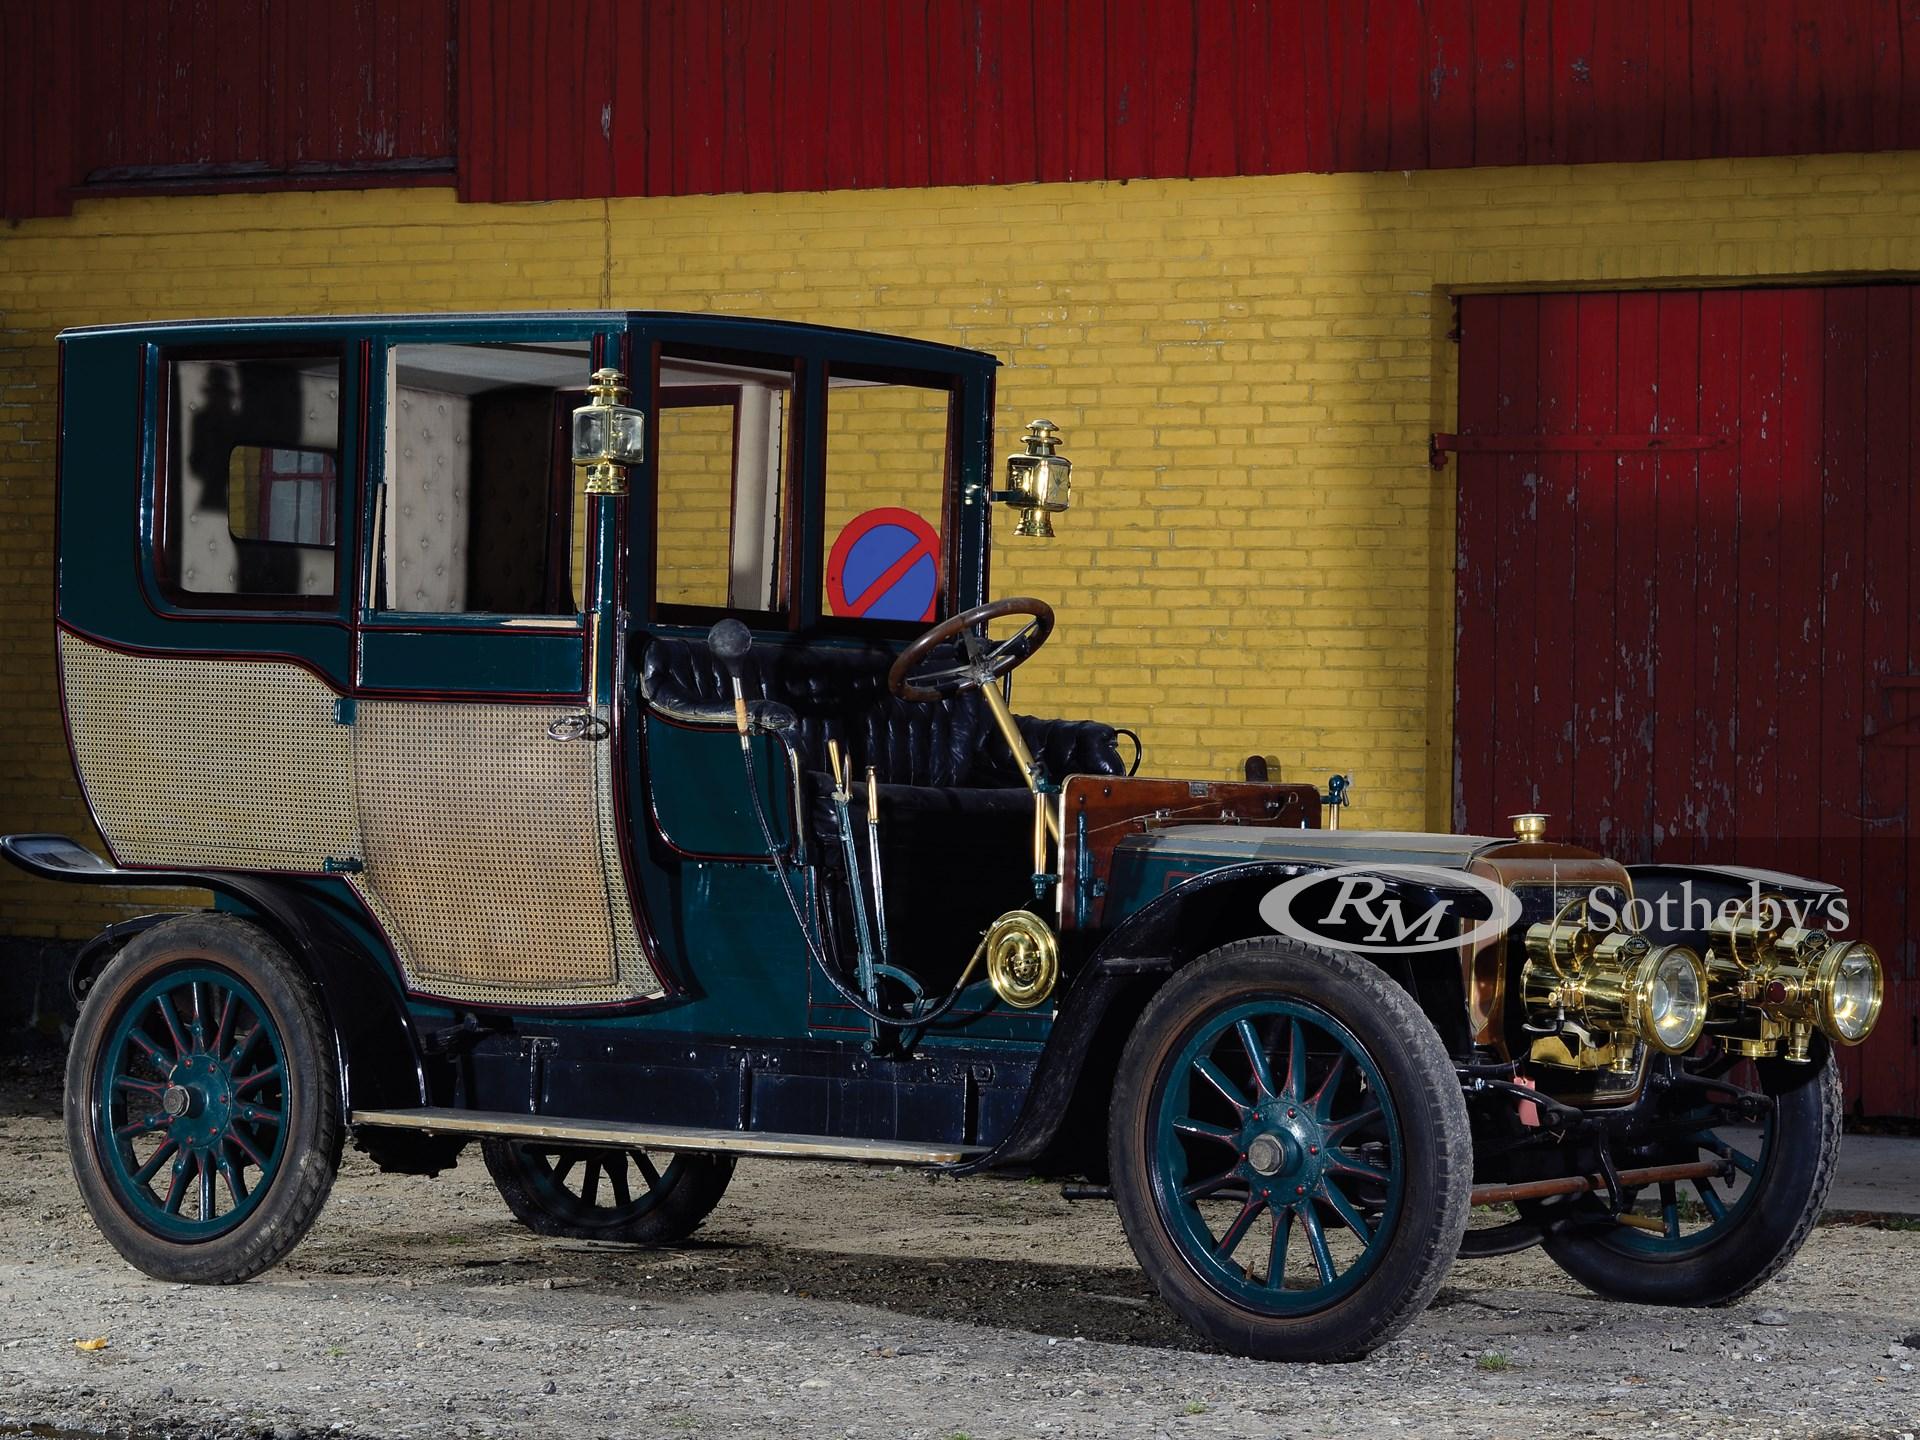 1908 Panhard & Levassor Type X1 Coupé Chauffeur by Rothschild